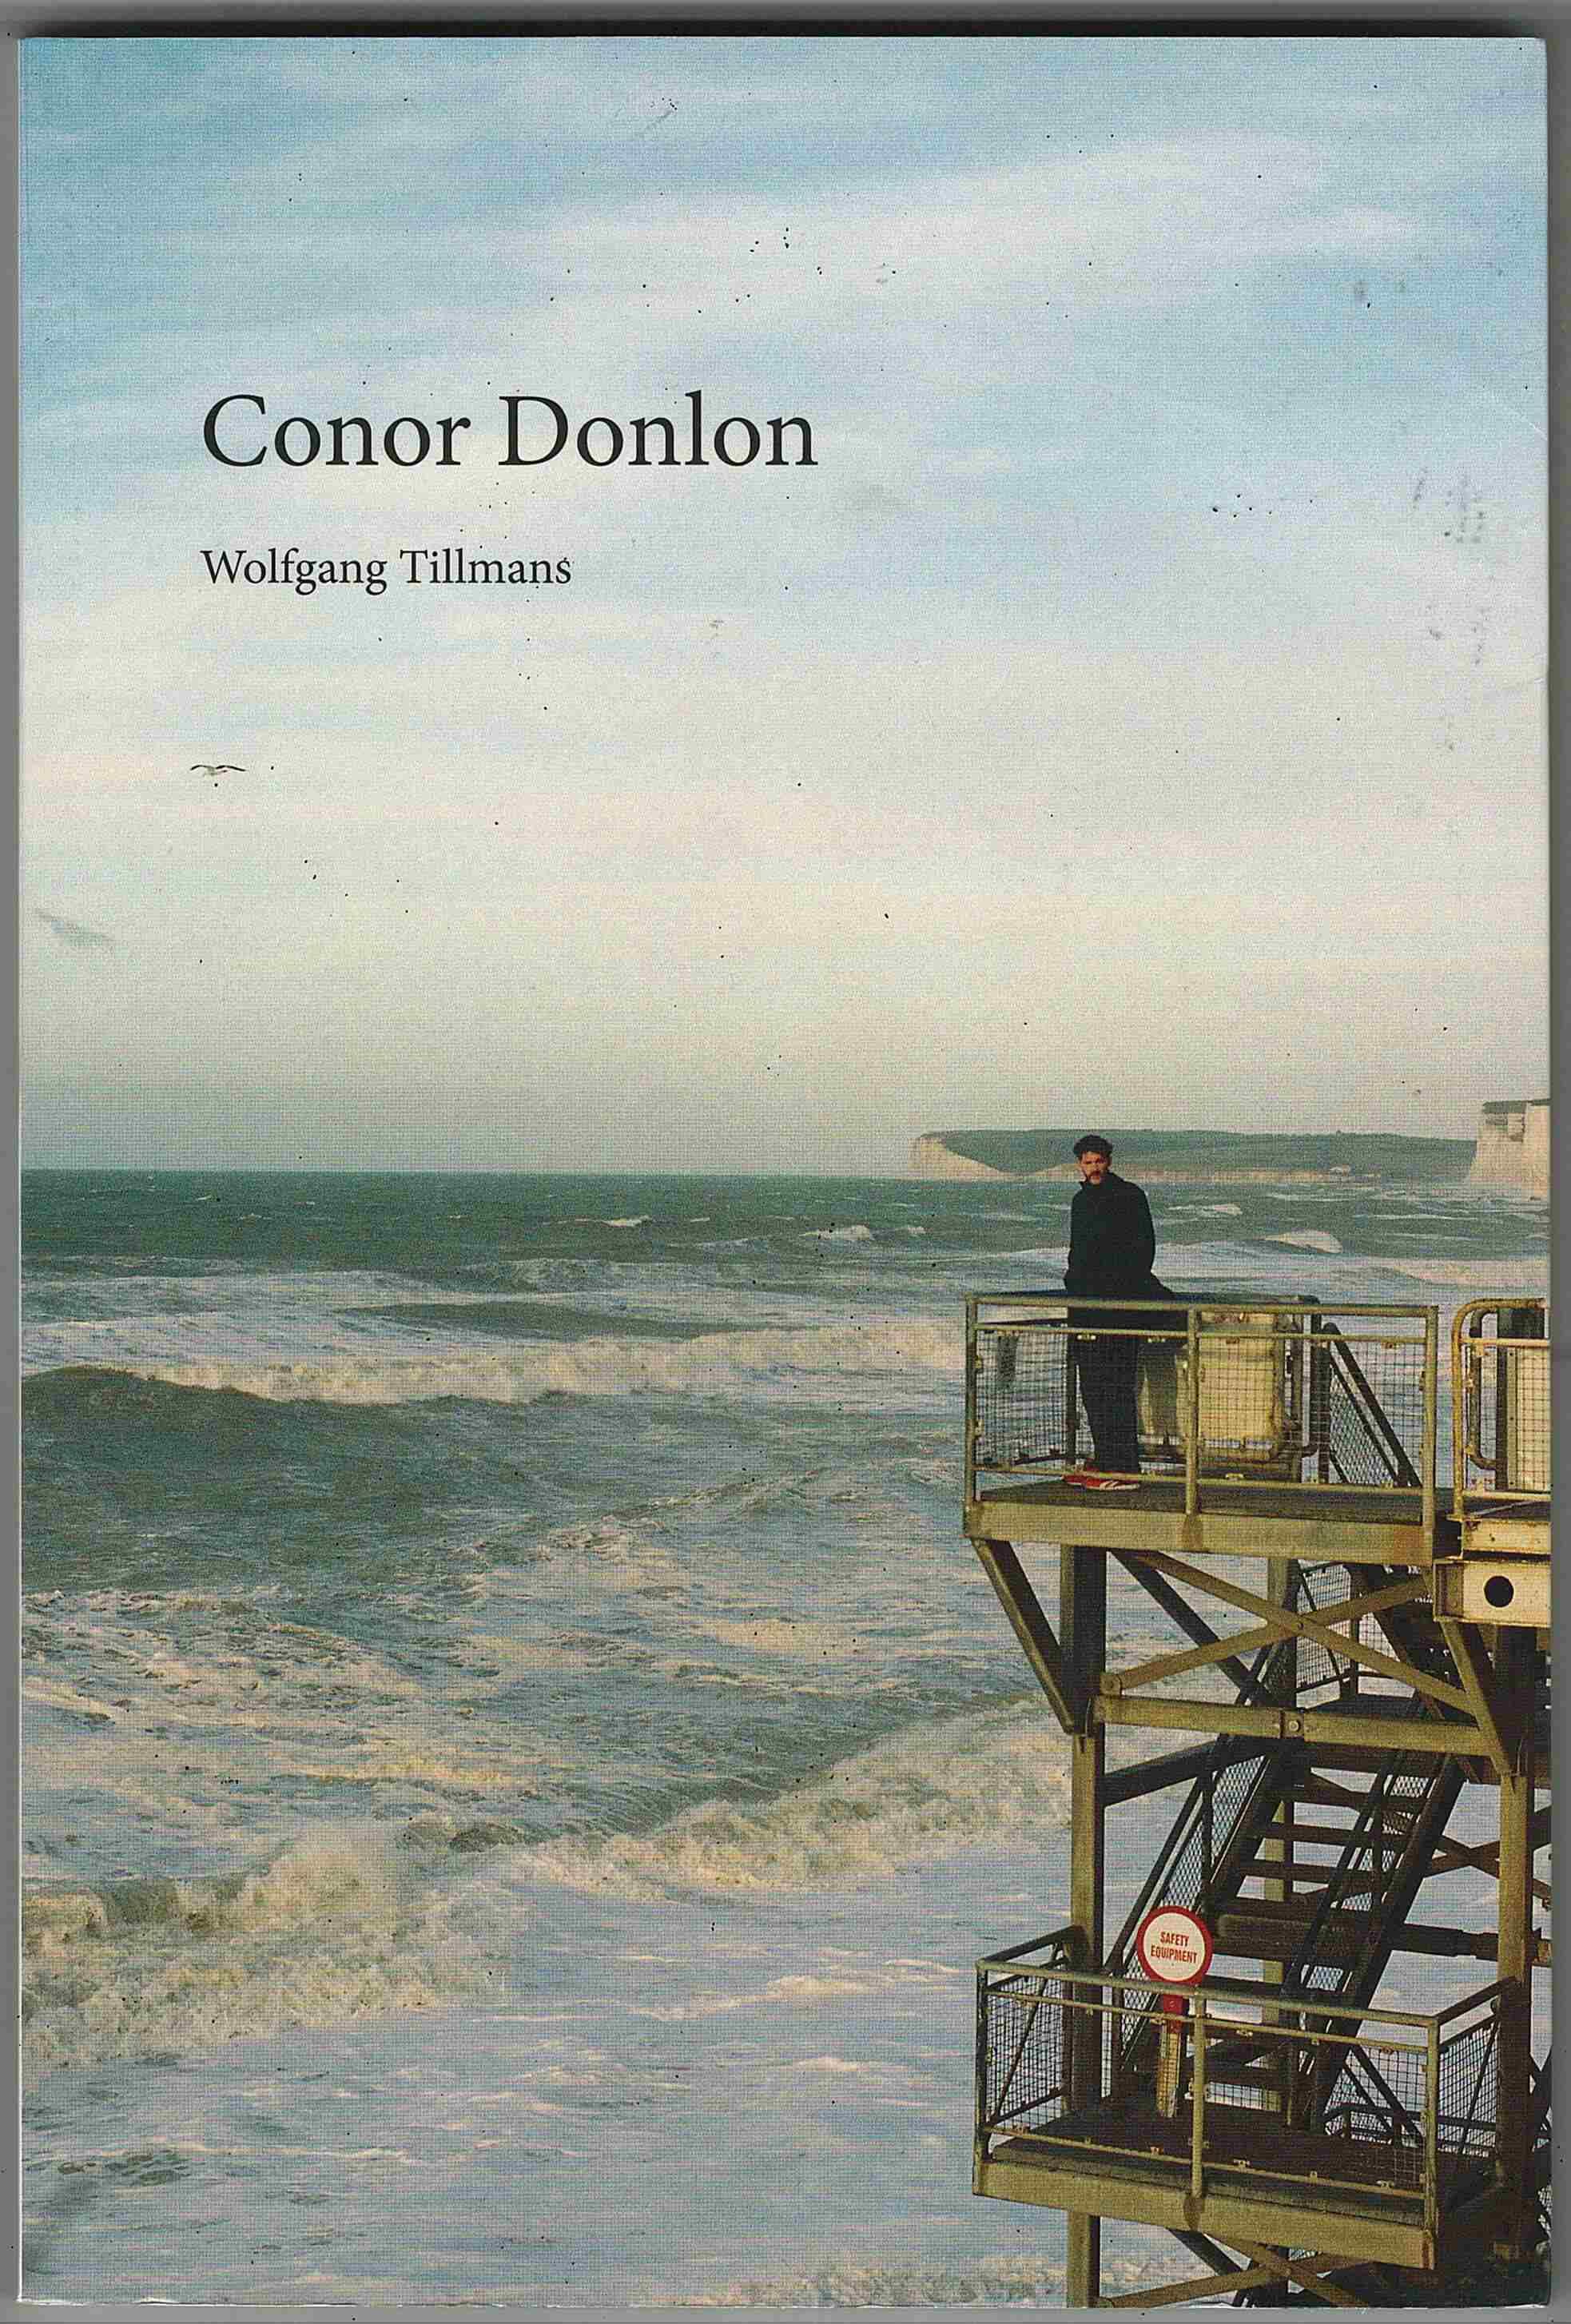 Conor Donlon